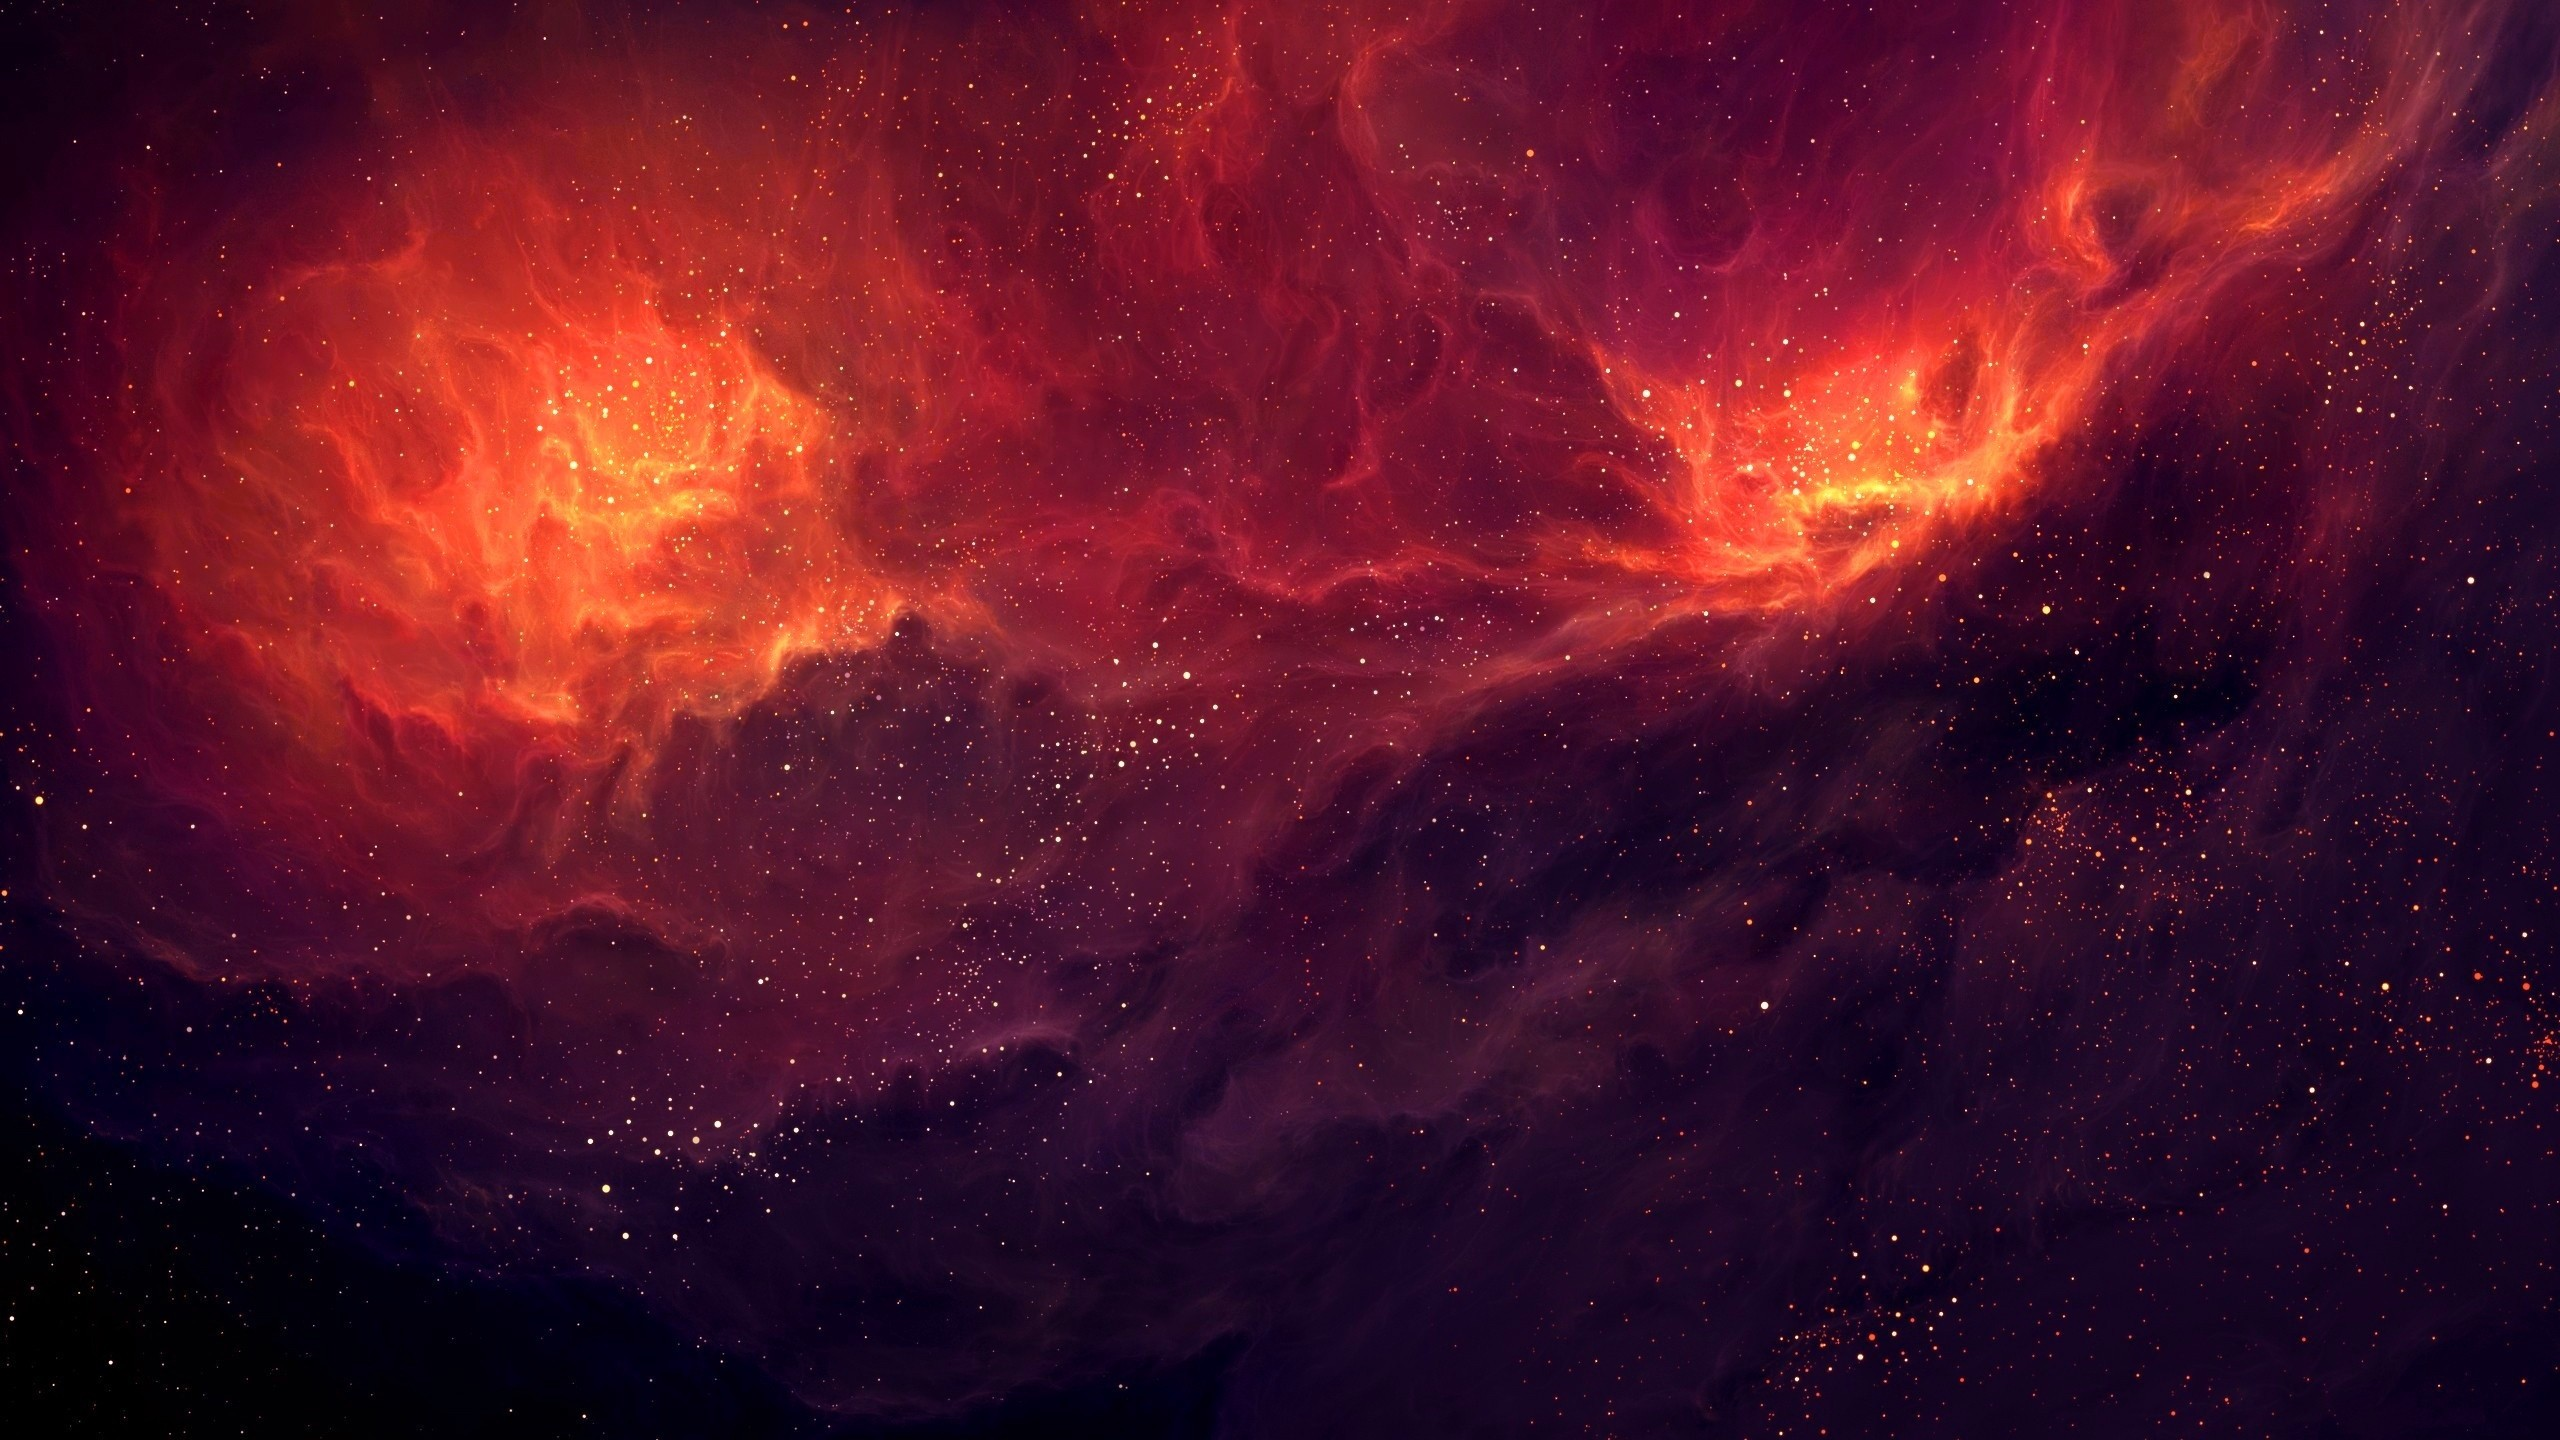 Space Stars Clouds